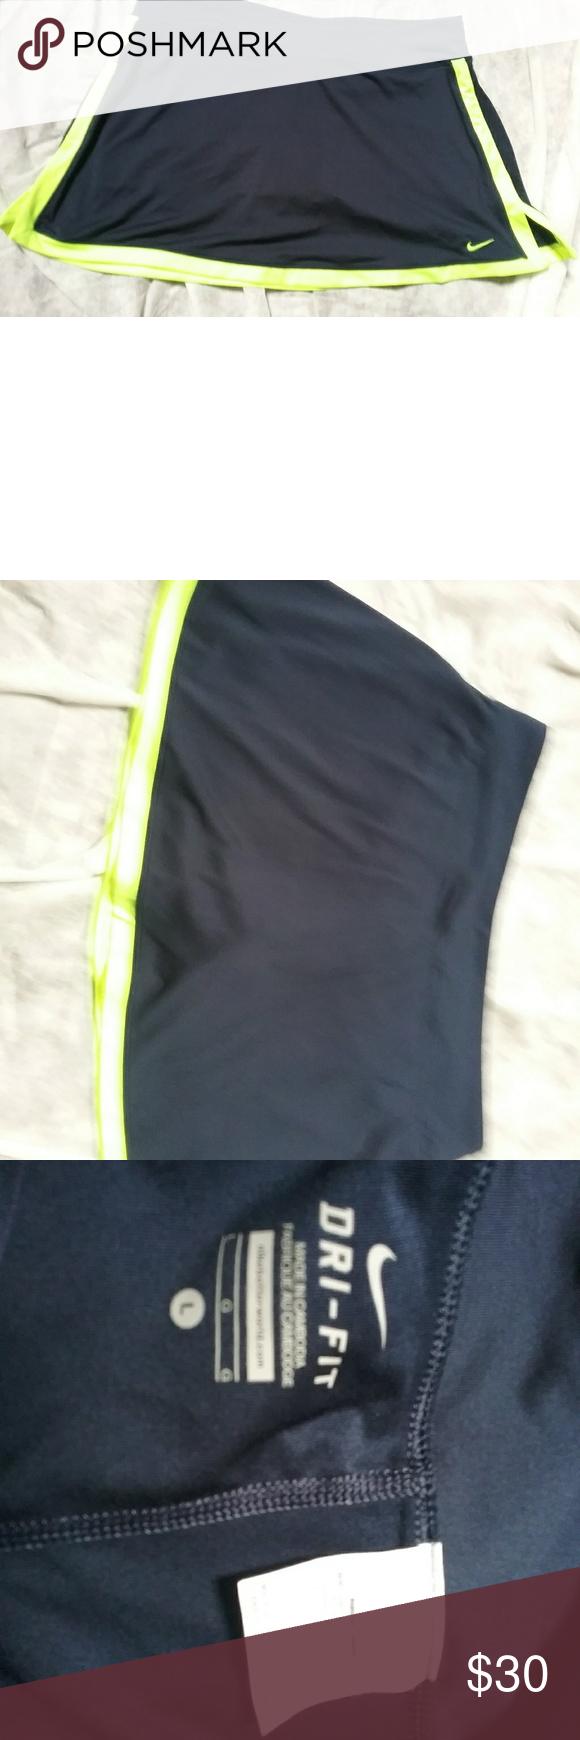 Nike Border Tennis Skort Navy Neon Yellow | Tennis skort